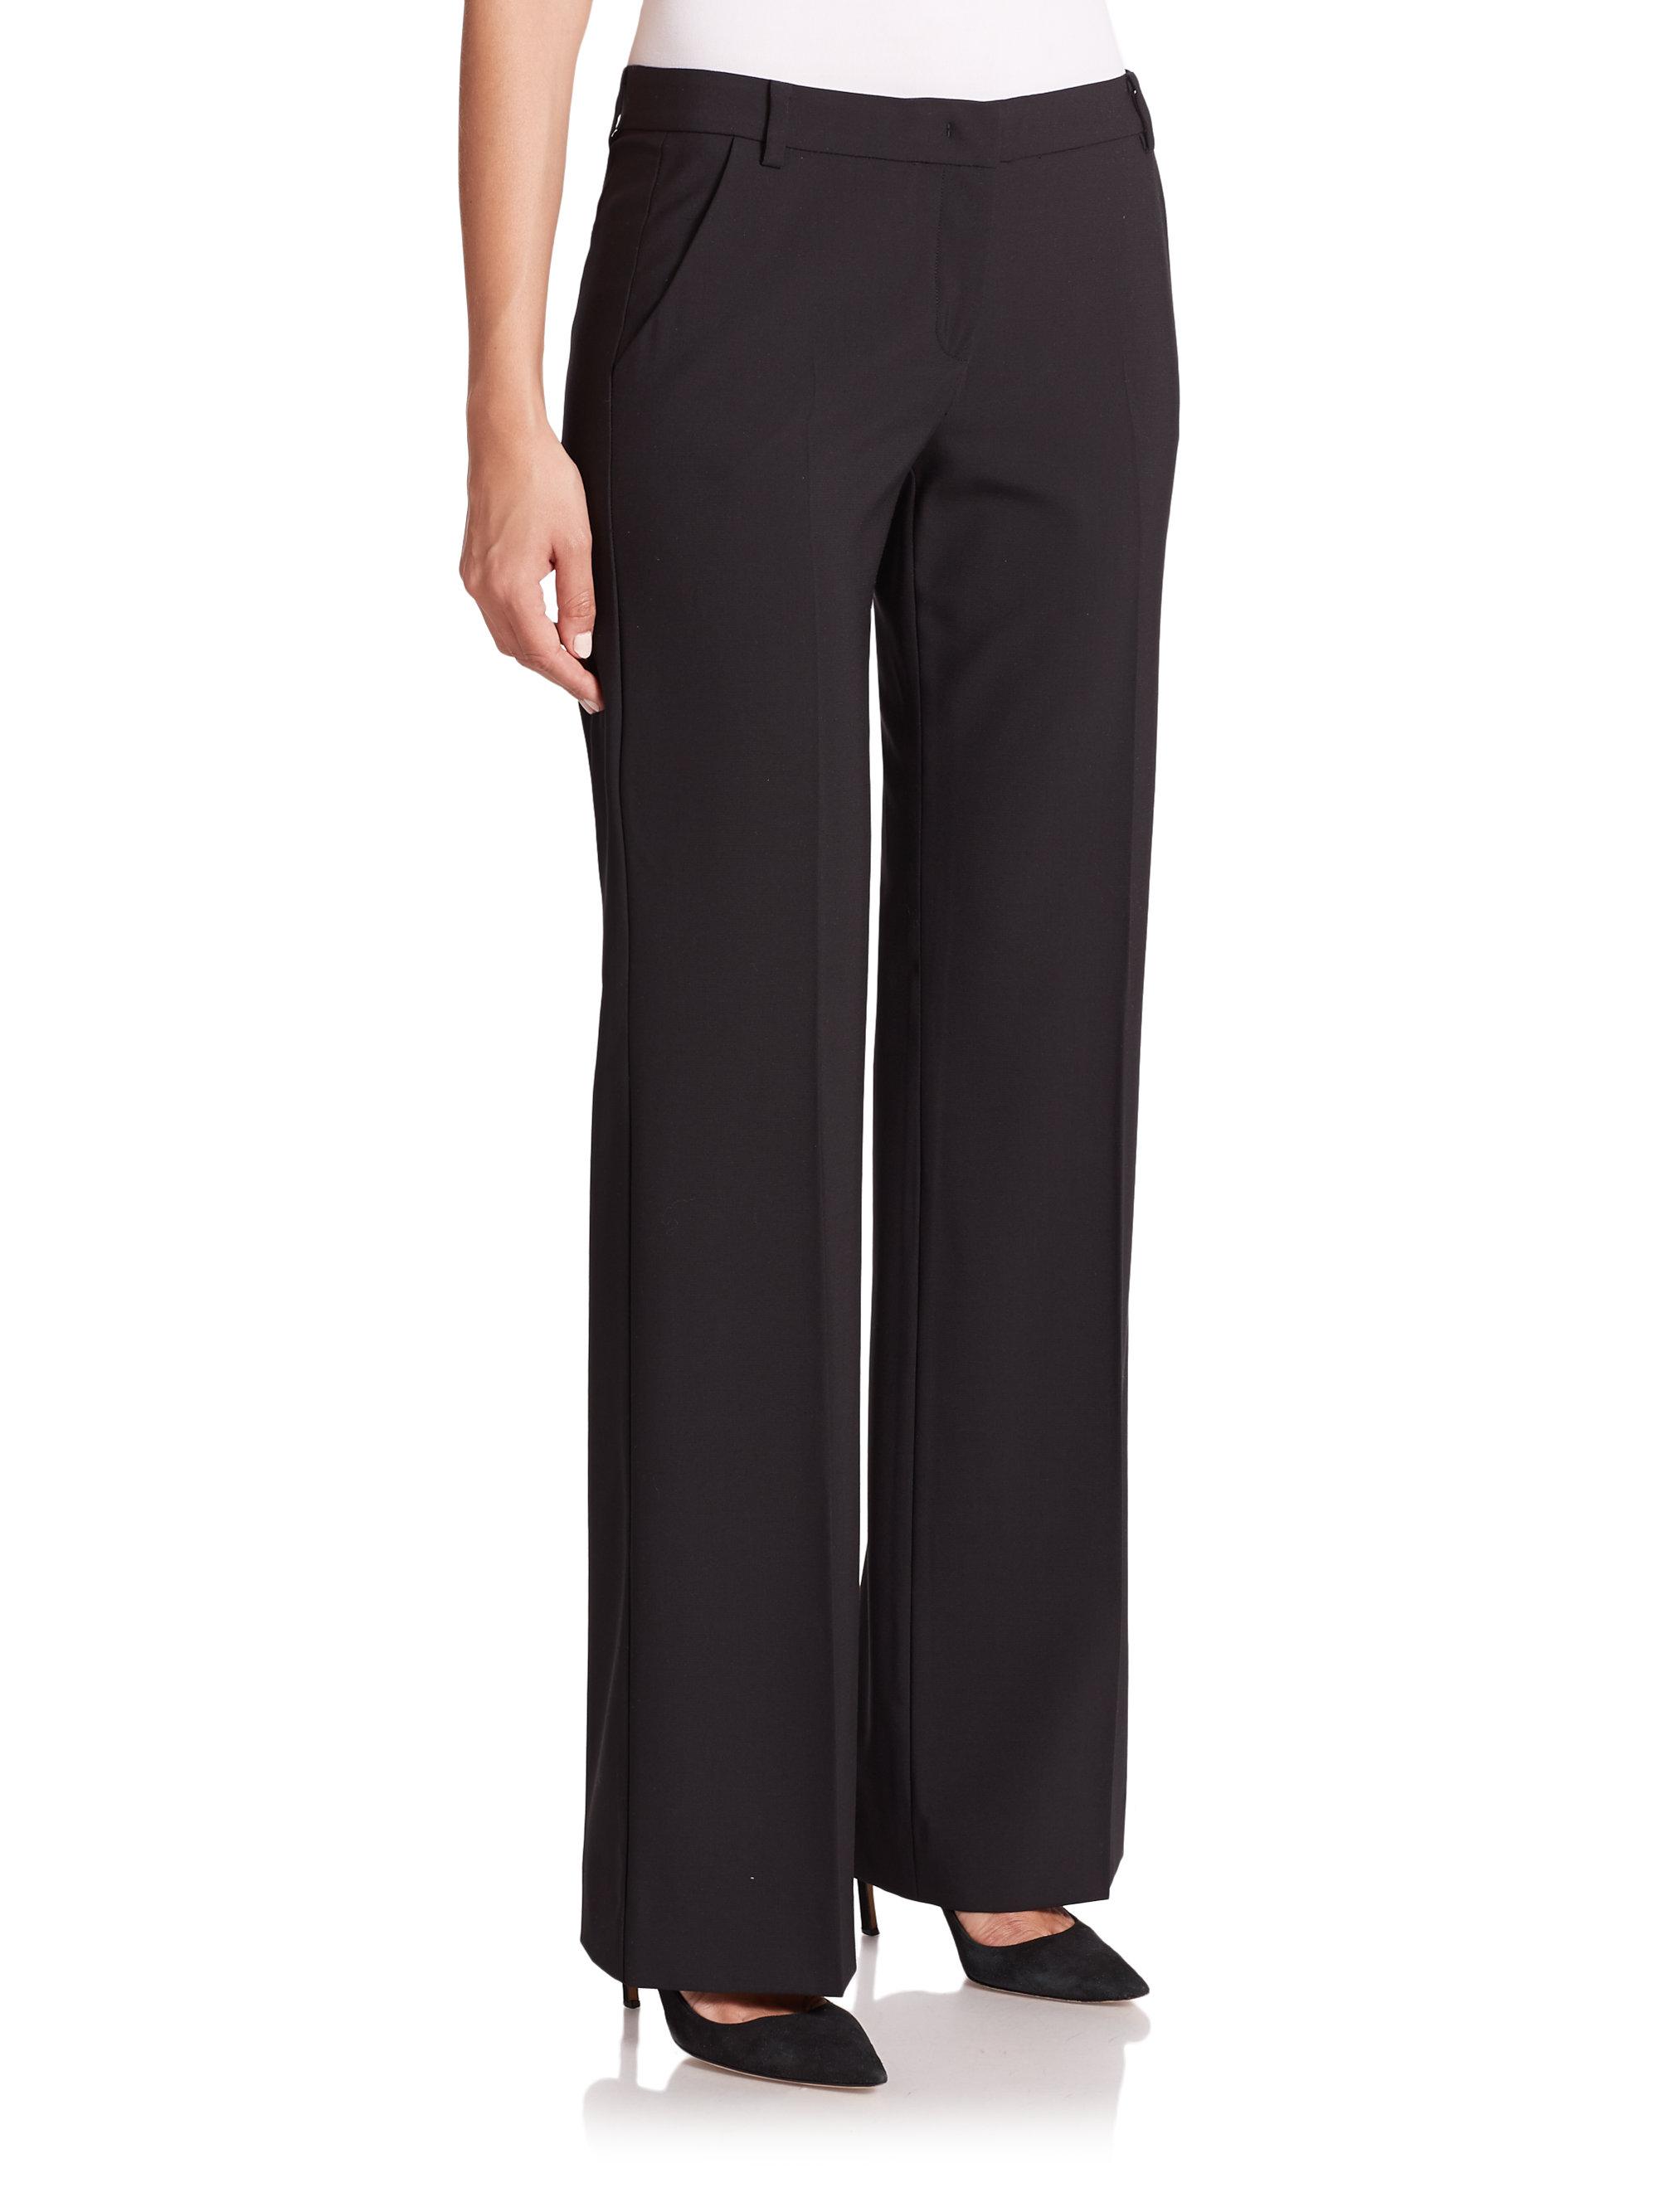 Popular Banana Republic Women39s Gray Tailored Slim Noniron Charcoal Pinstripe